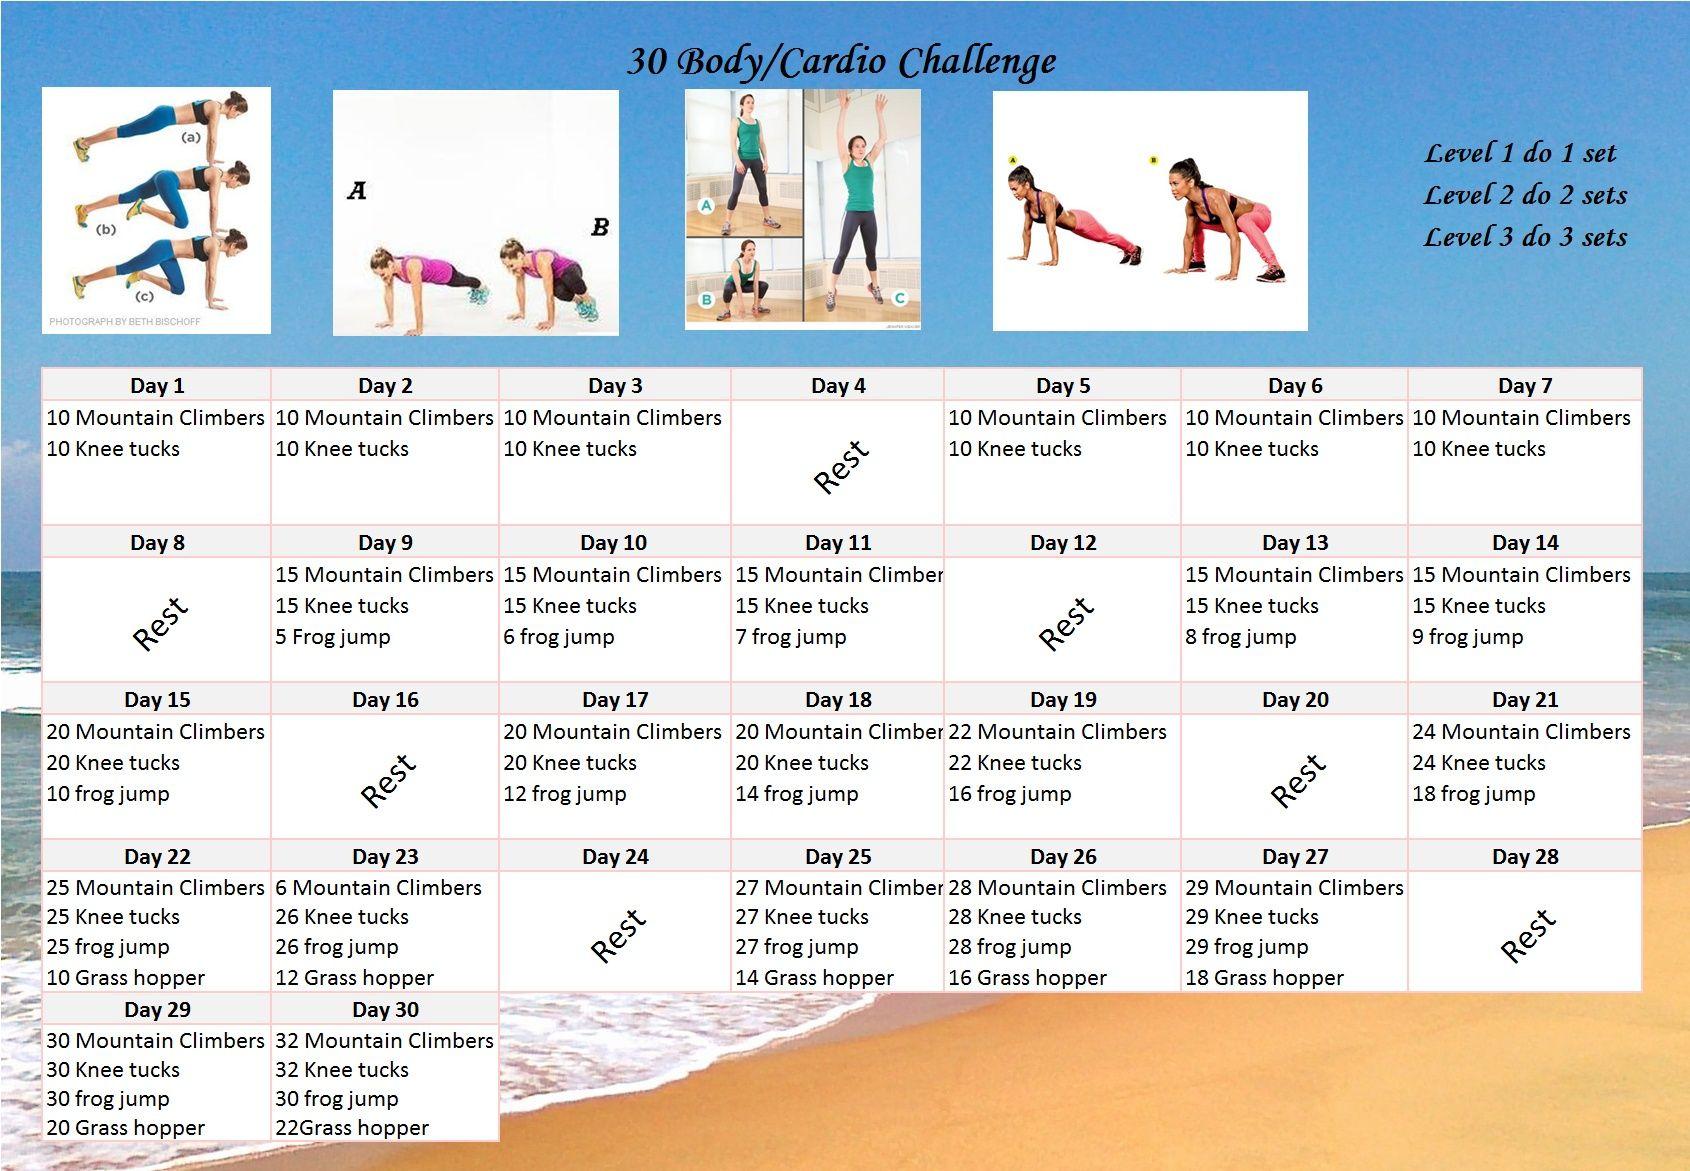 Fitness Challenge: 30 Day Body/Cardio Calendar Challenge throughout 30 Day Fitness Calendar